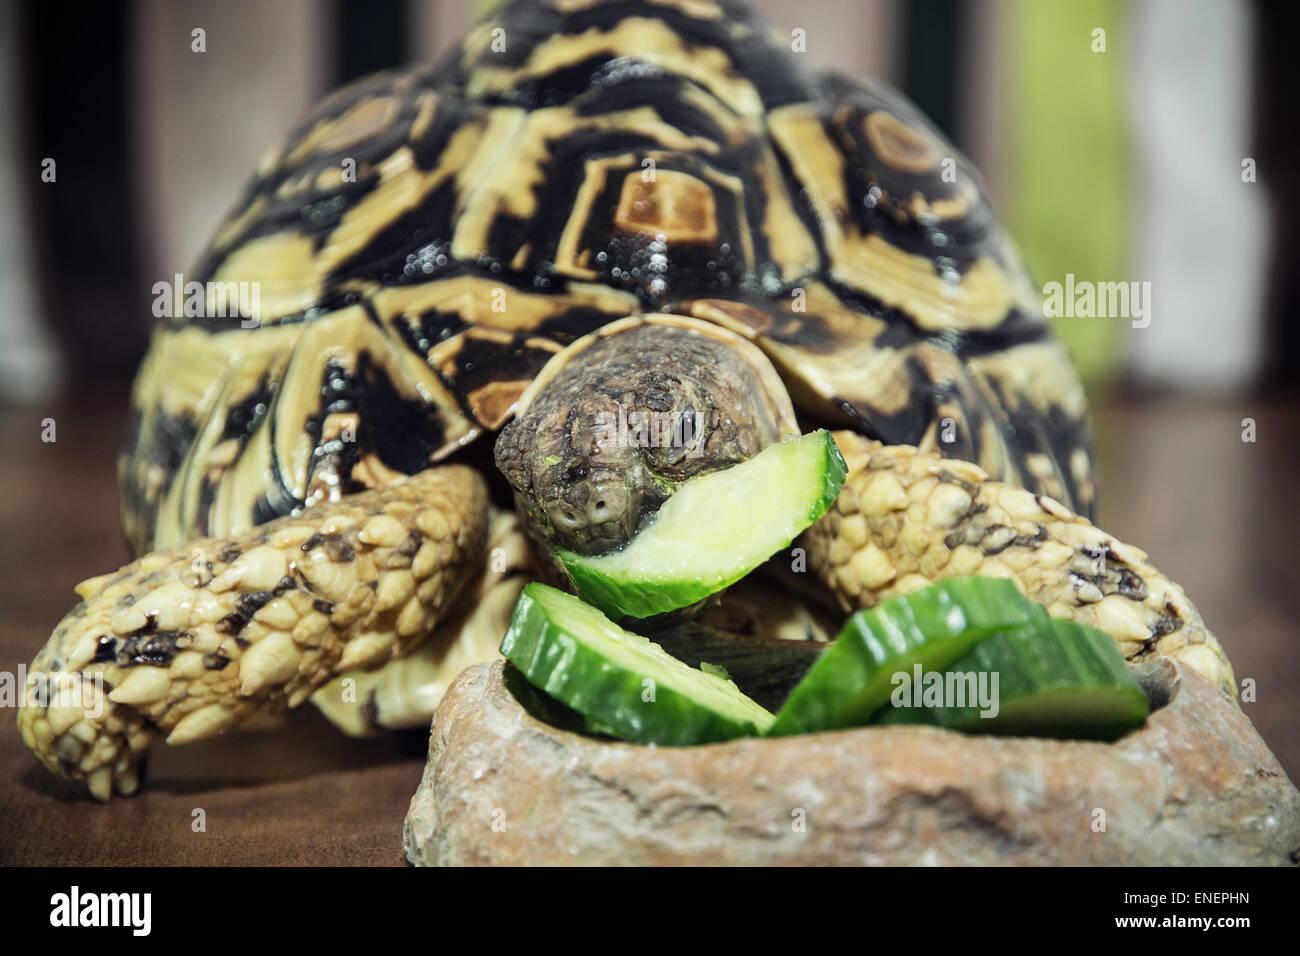 Leopard tortoise (Geochelone pardalis) is feeding. Animal theme. - Stock Image